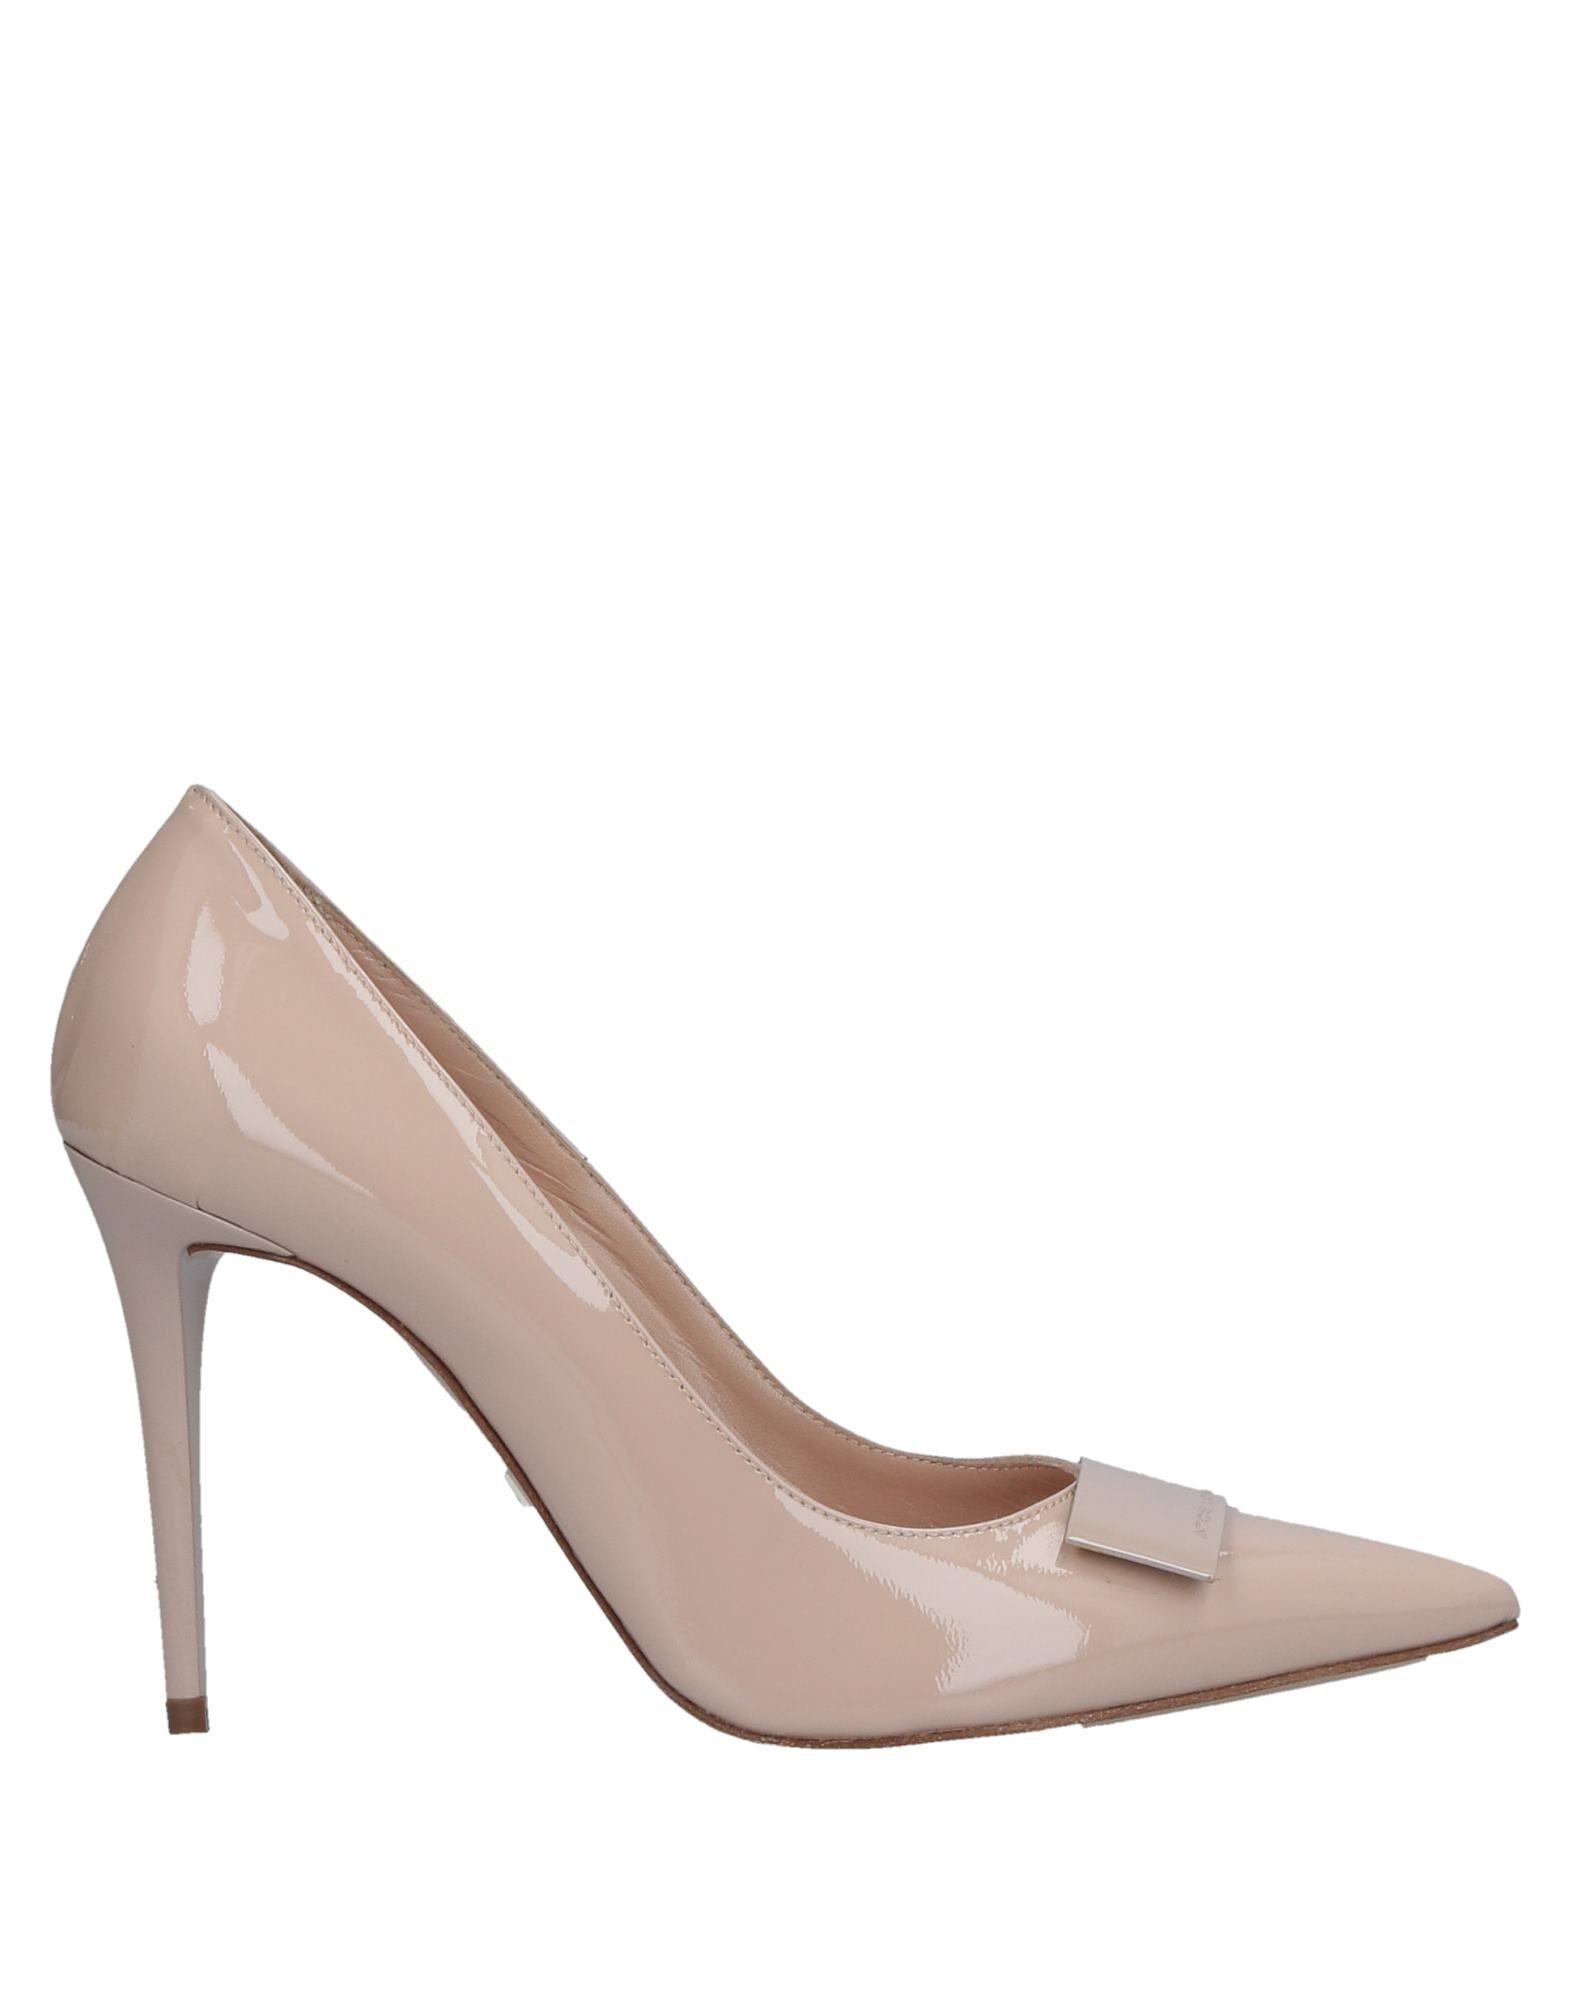 Stilvolle billige Schuhe Atos Lombardini Pumps Damen  11372810UG